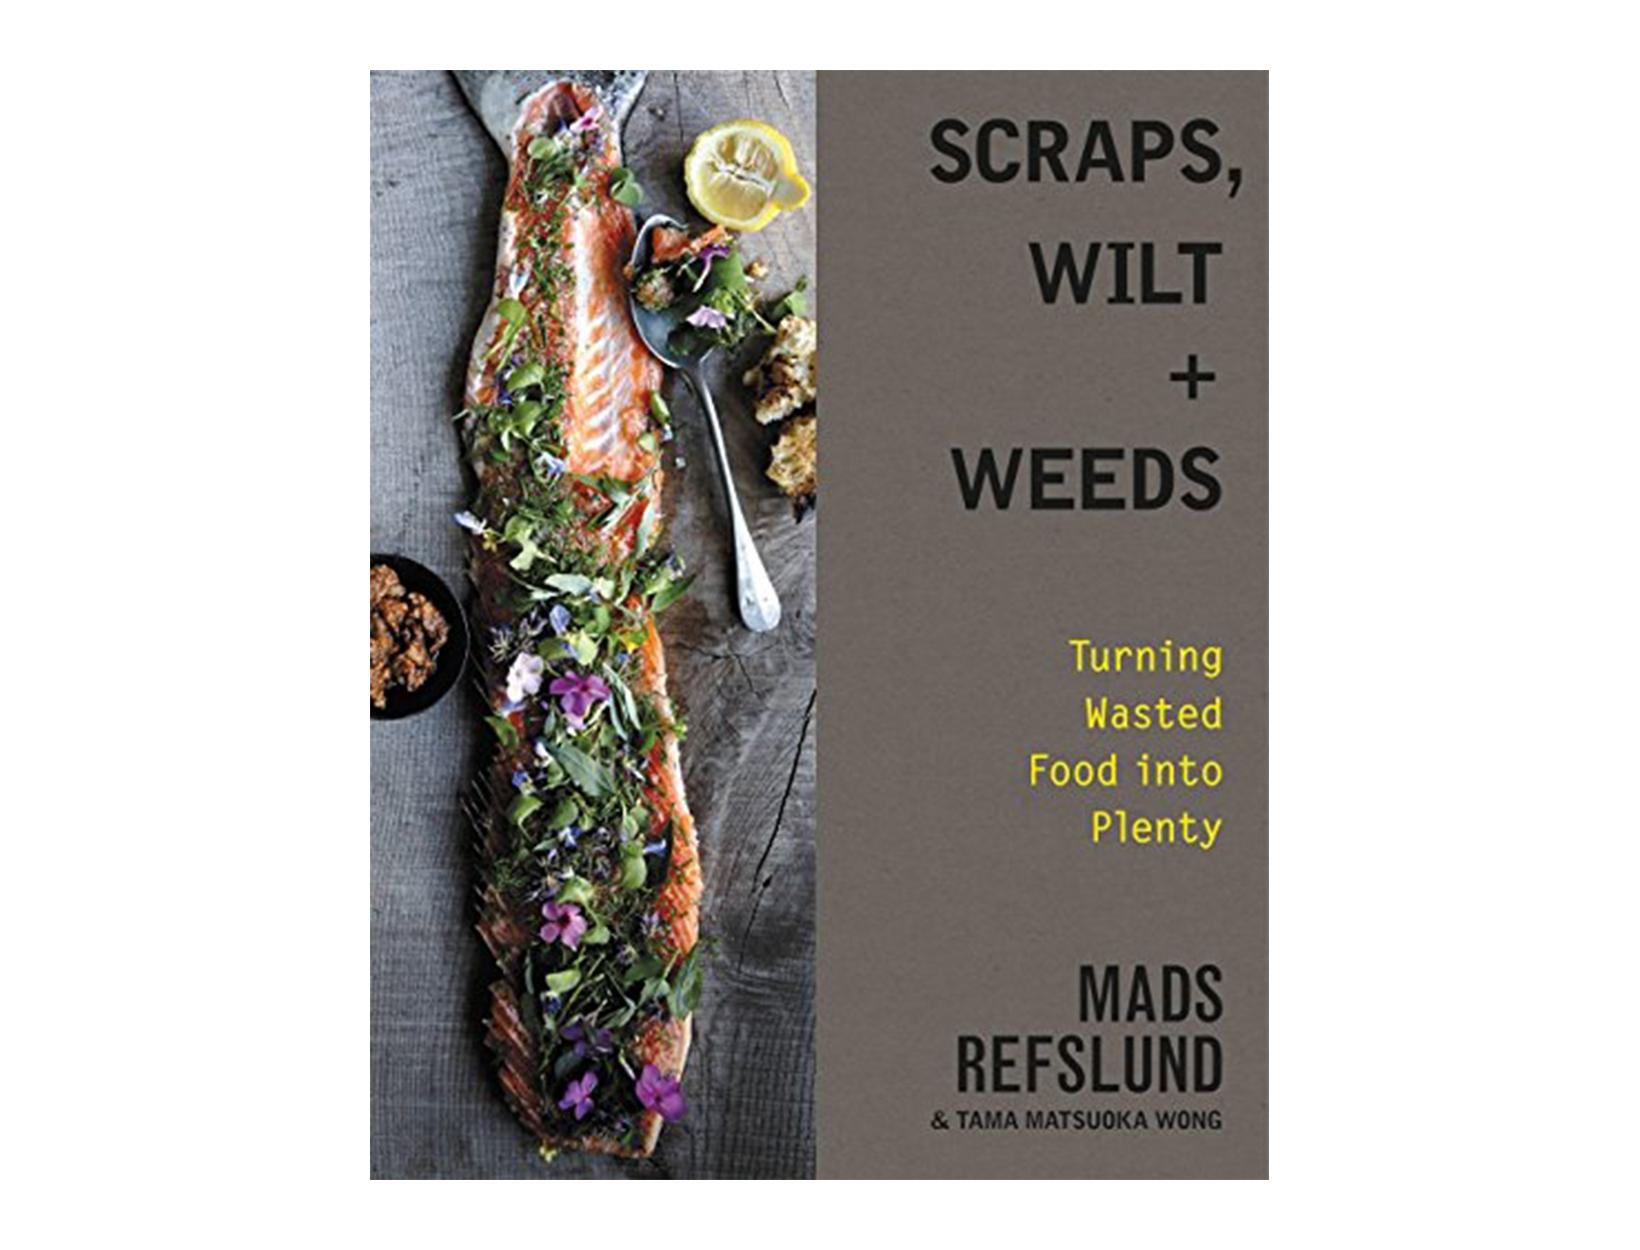 Scraps, Wilt & Weeds: Turning Wasted Food into Plenty by Mads Refslund